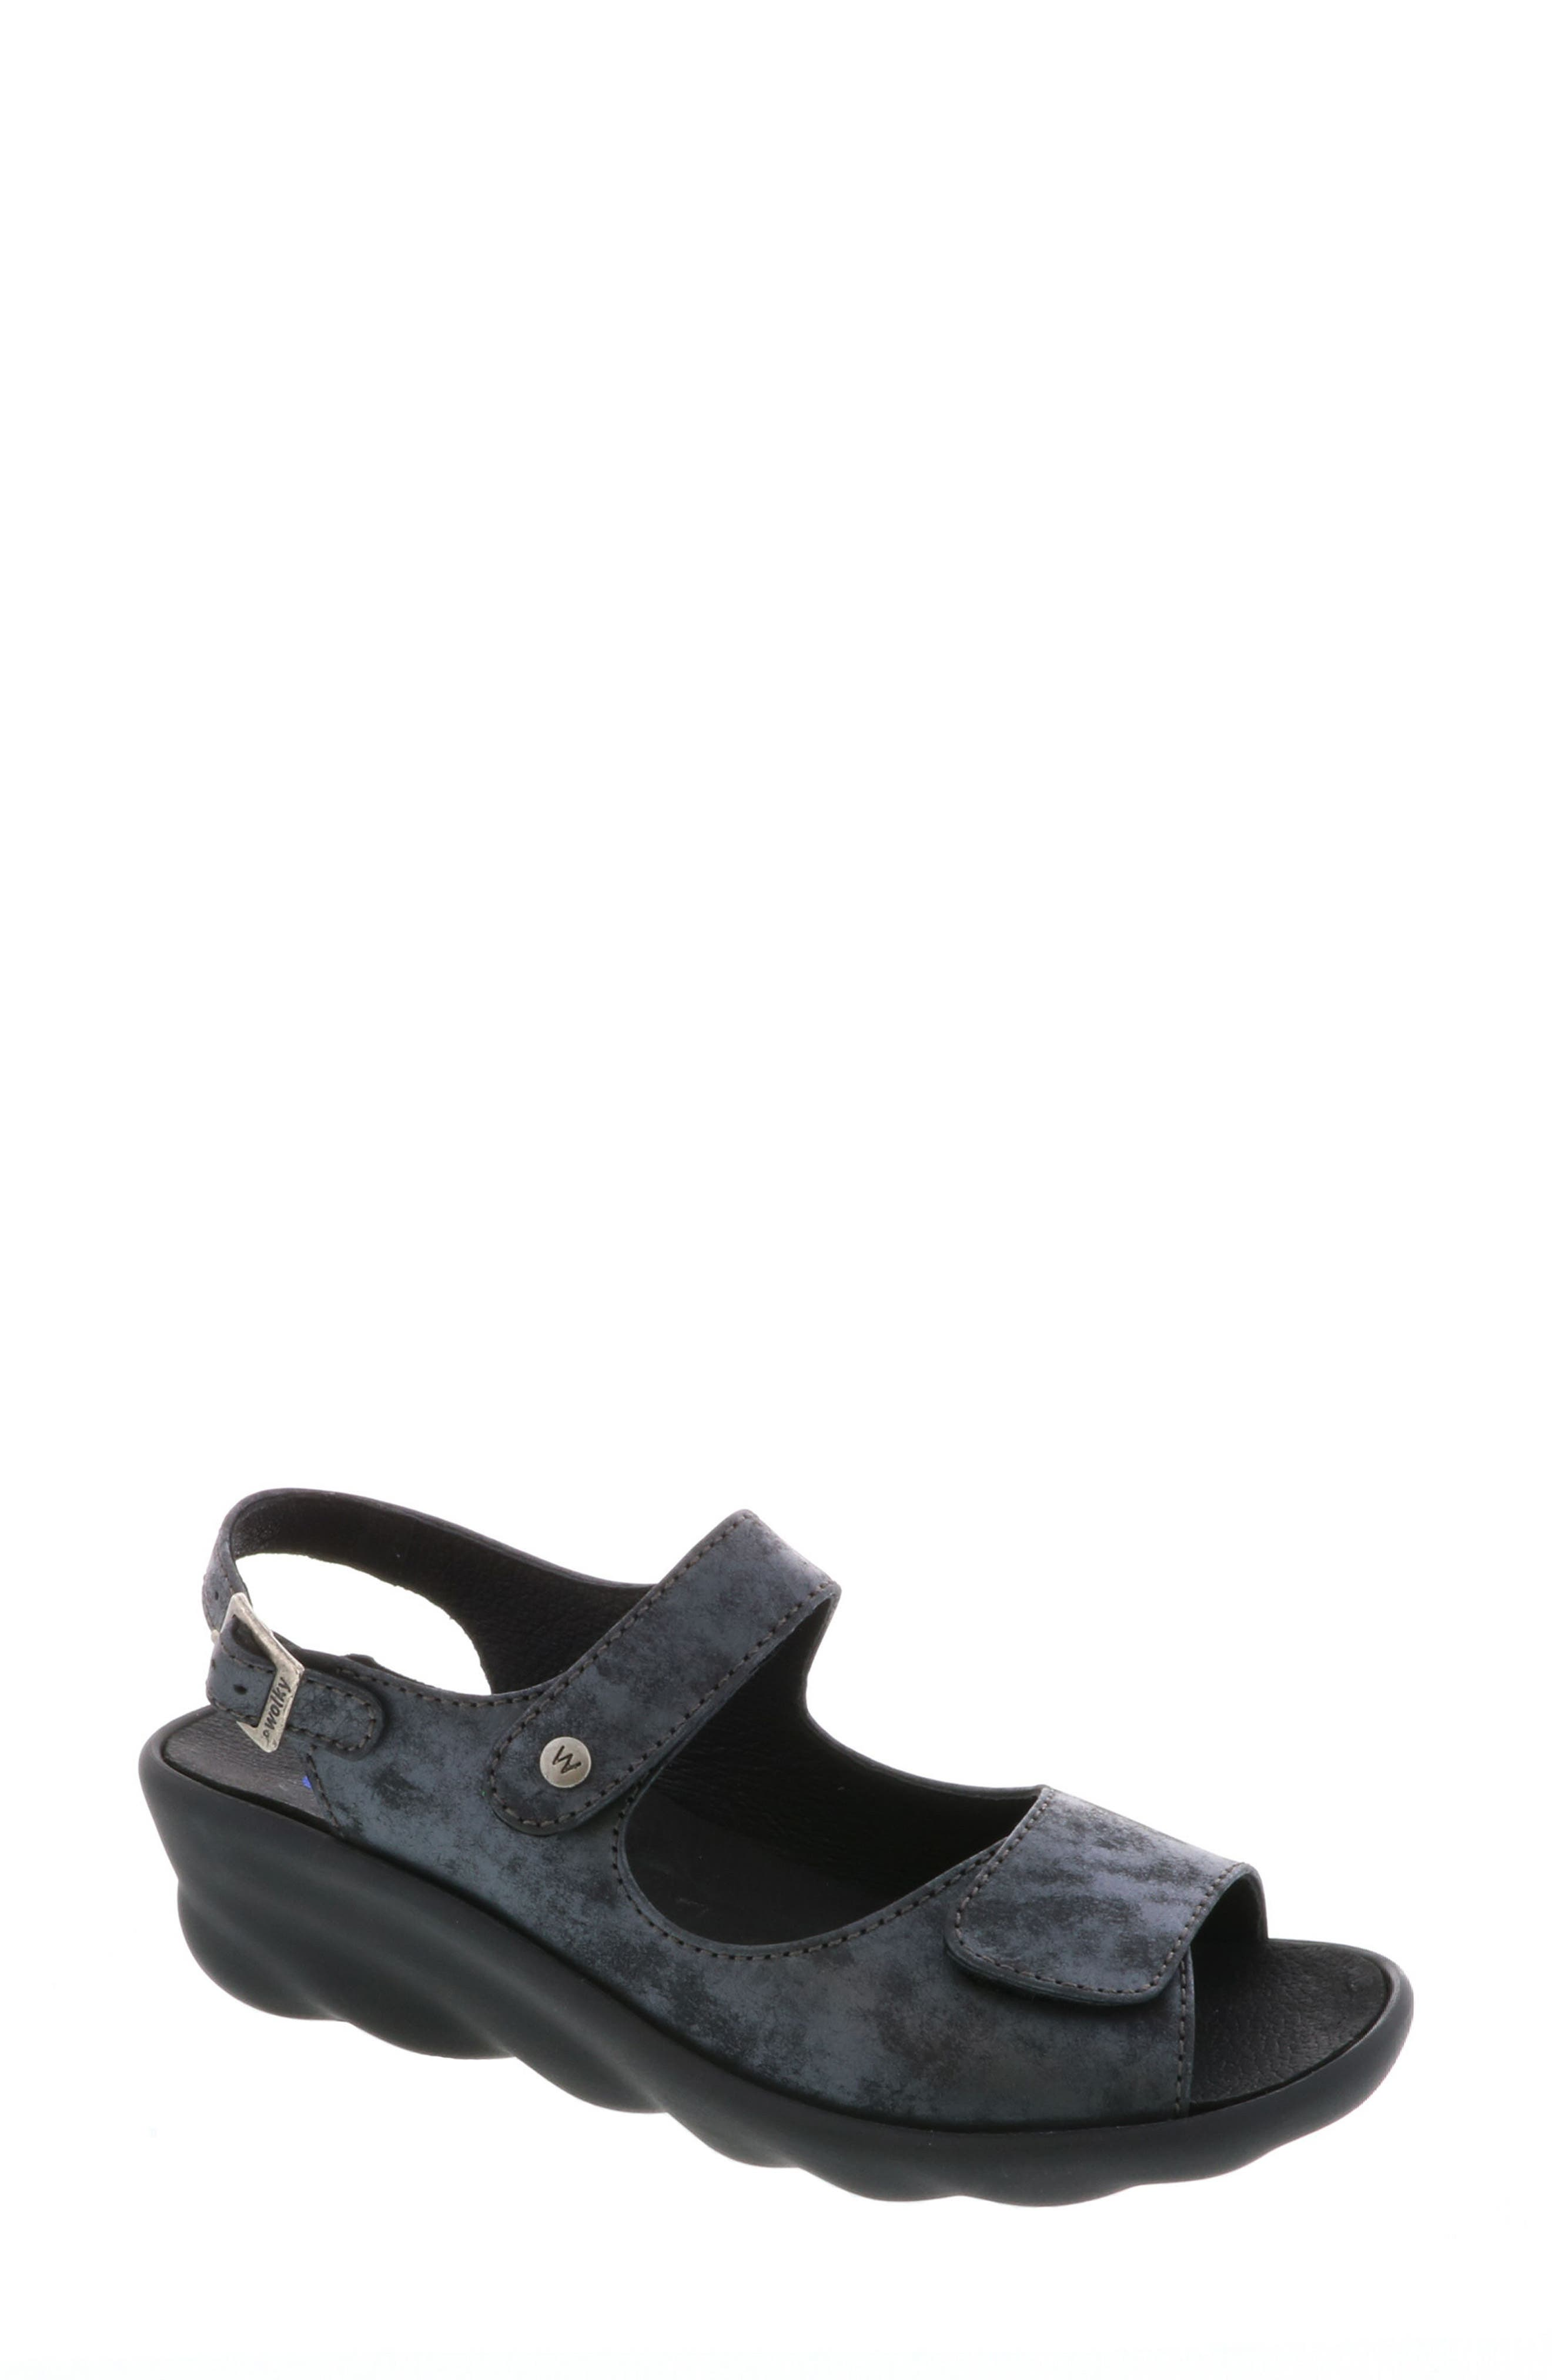 Scala Sandal,                         Main,                         color, BLACK NUBUCK